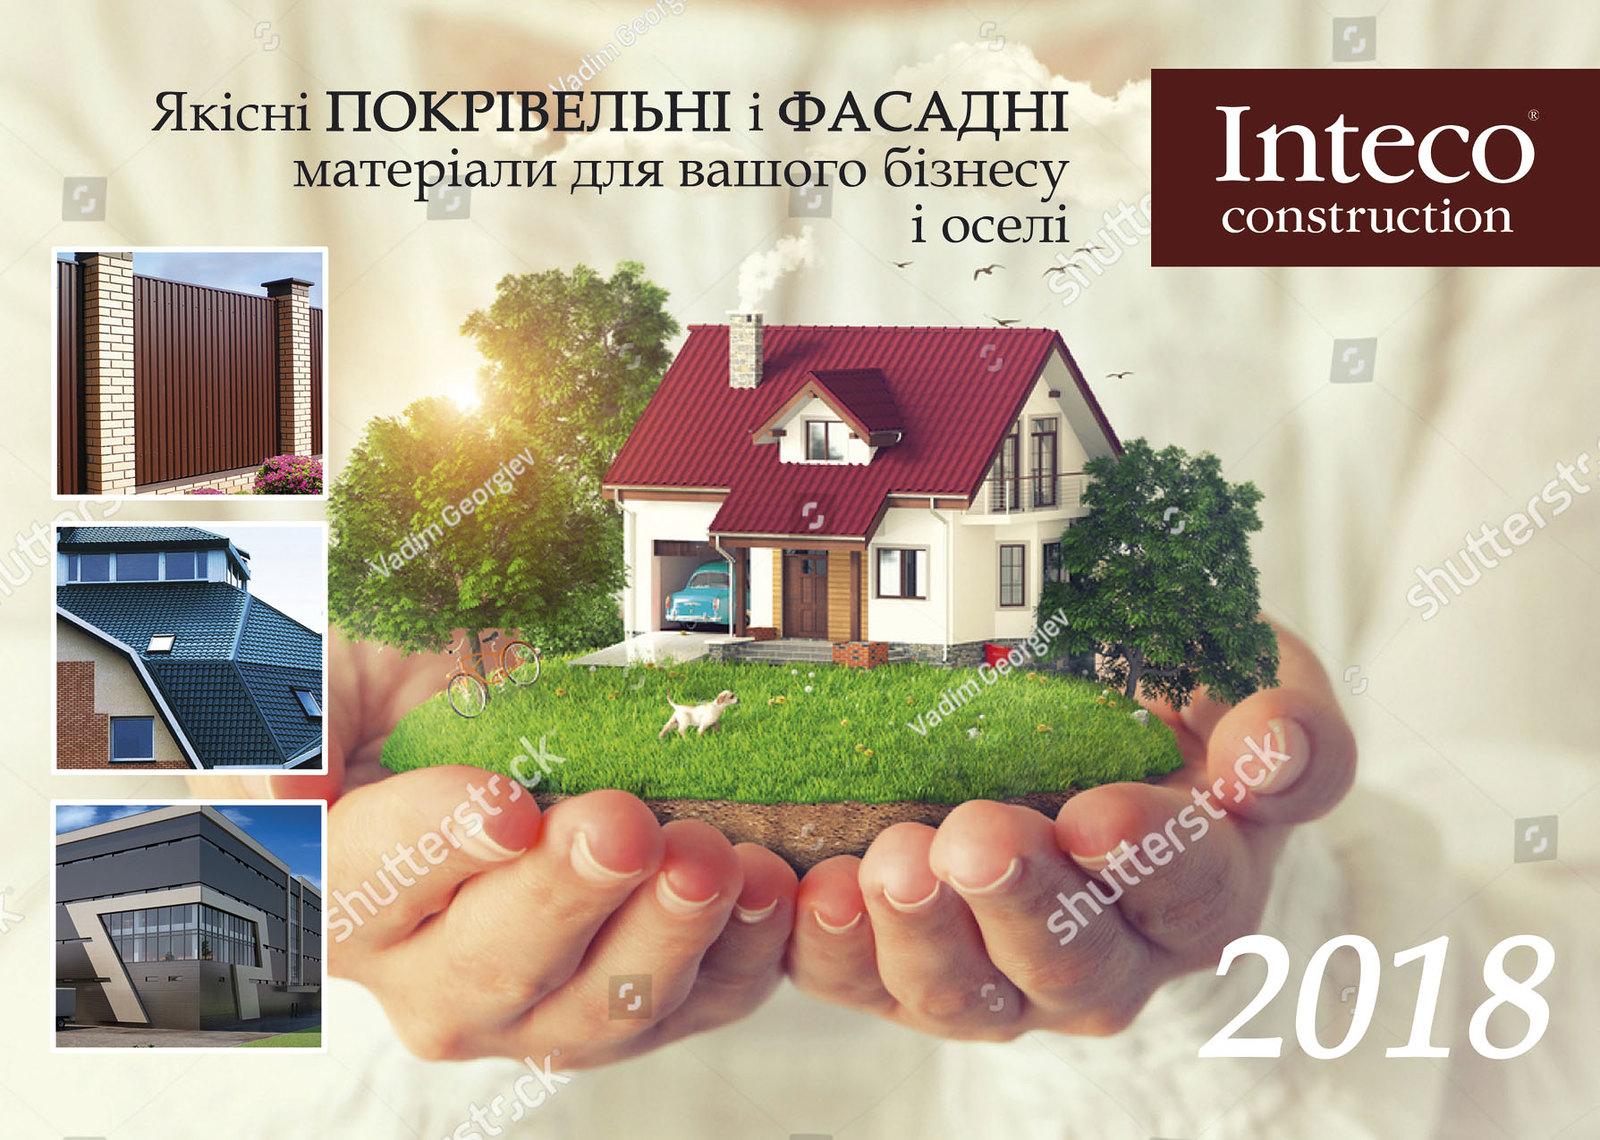 (01) Kalend Inteco 01 verh 08